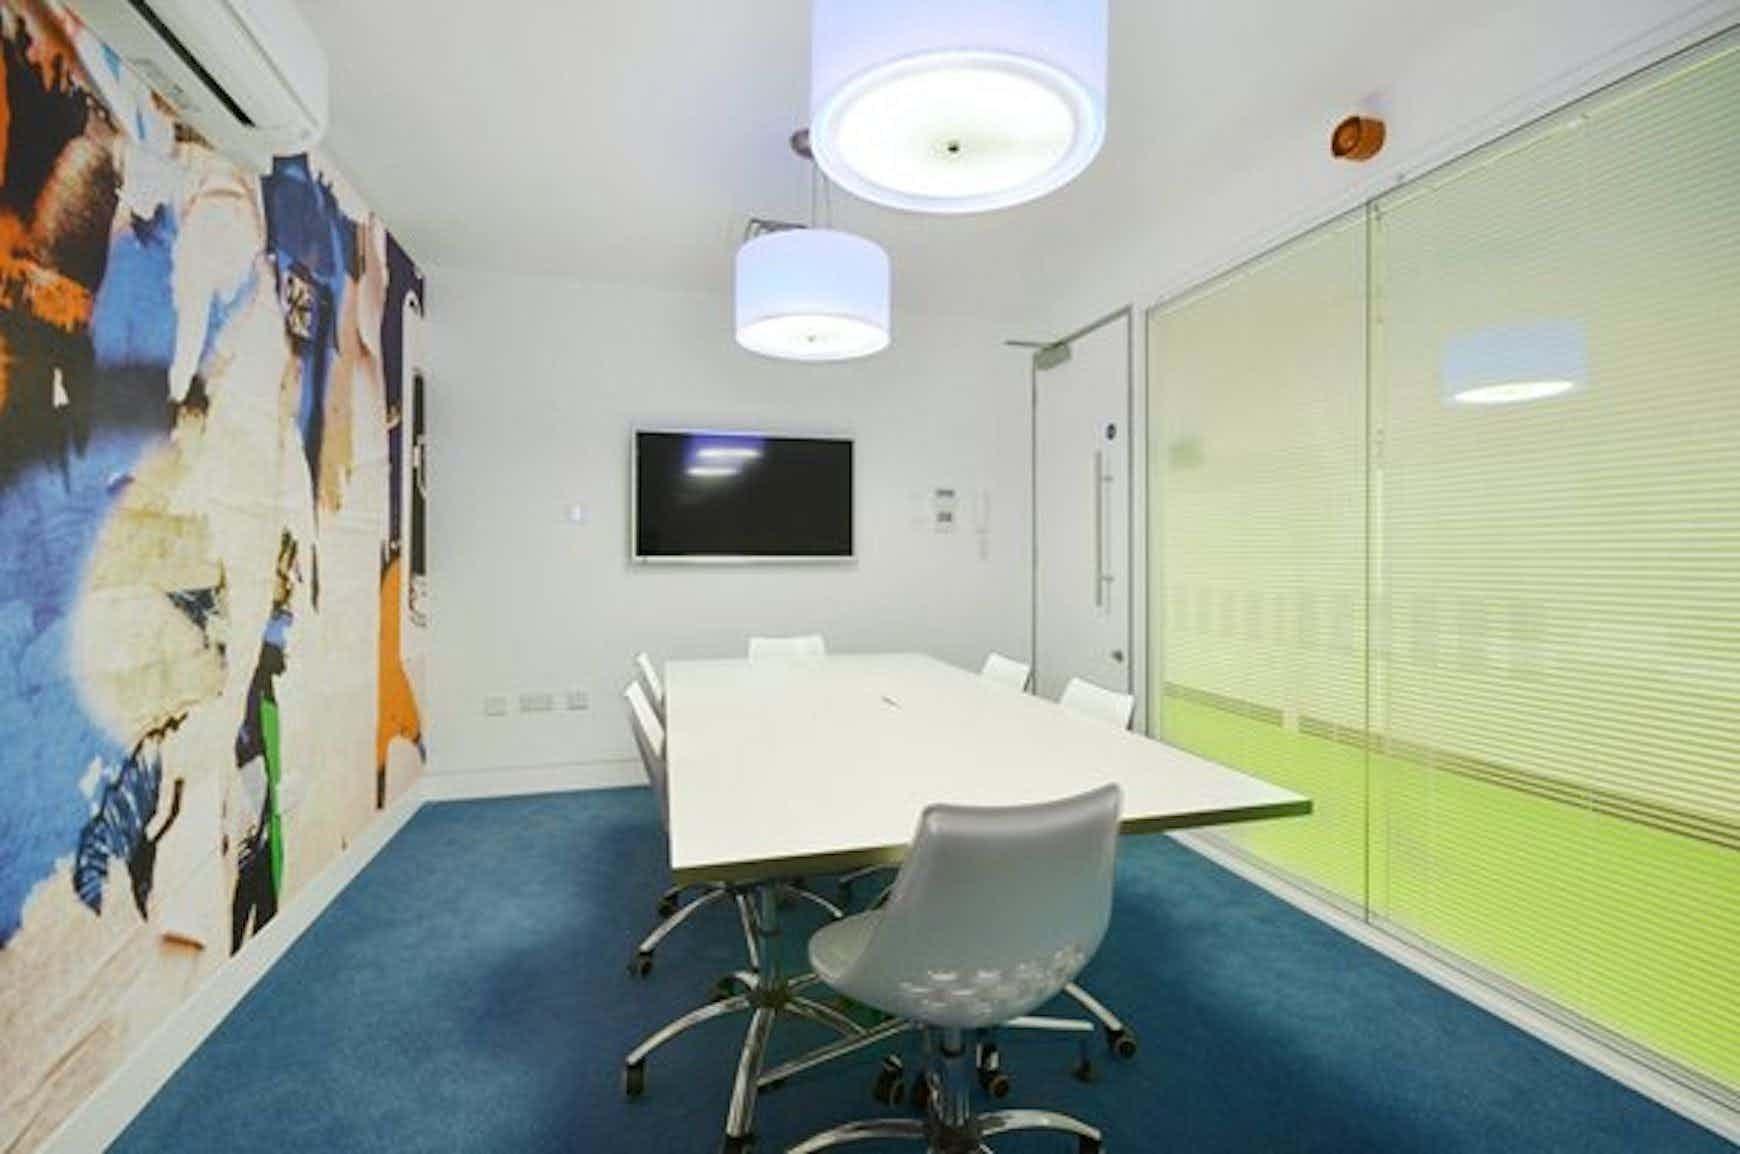 Meter - Chester House, Workspace Kennington Park